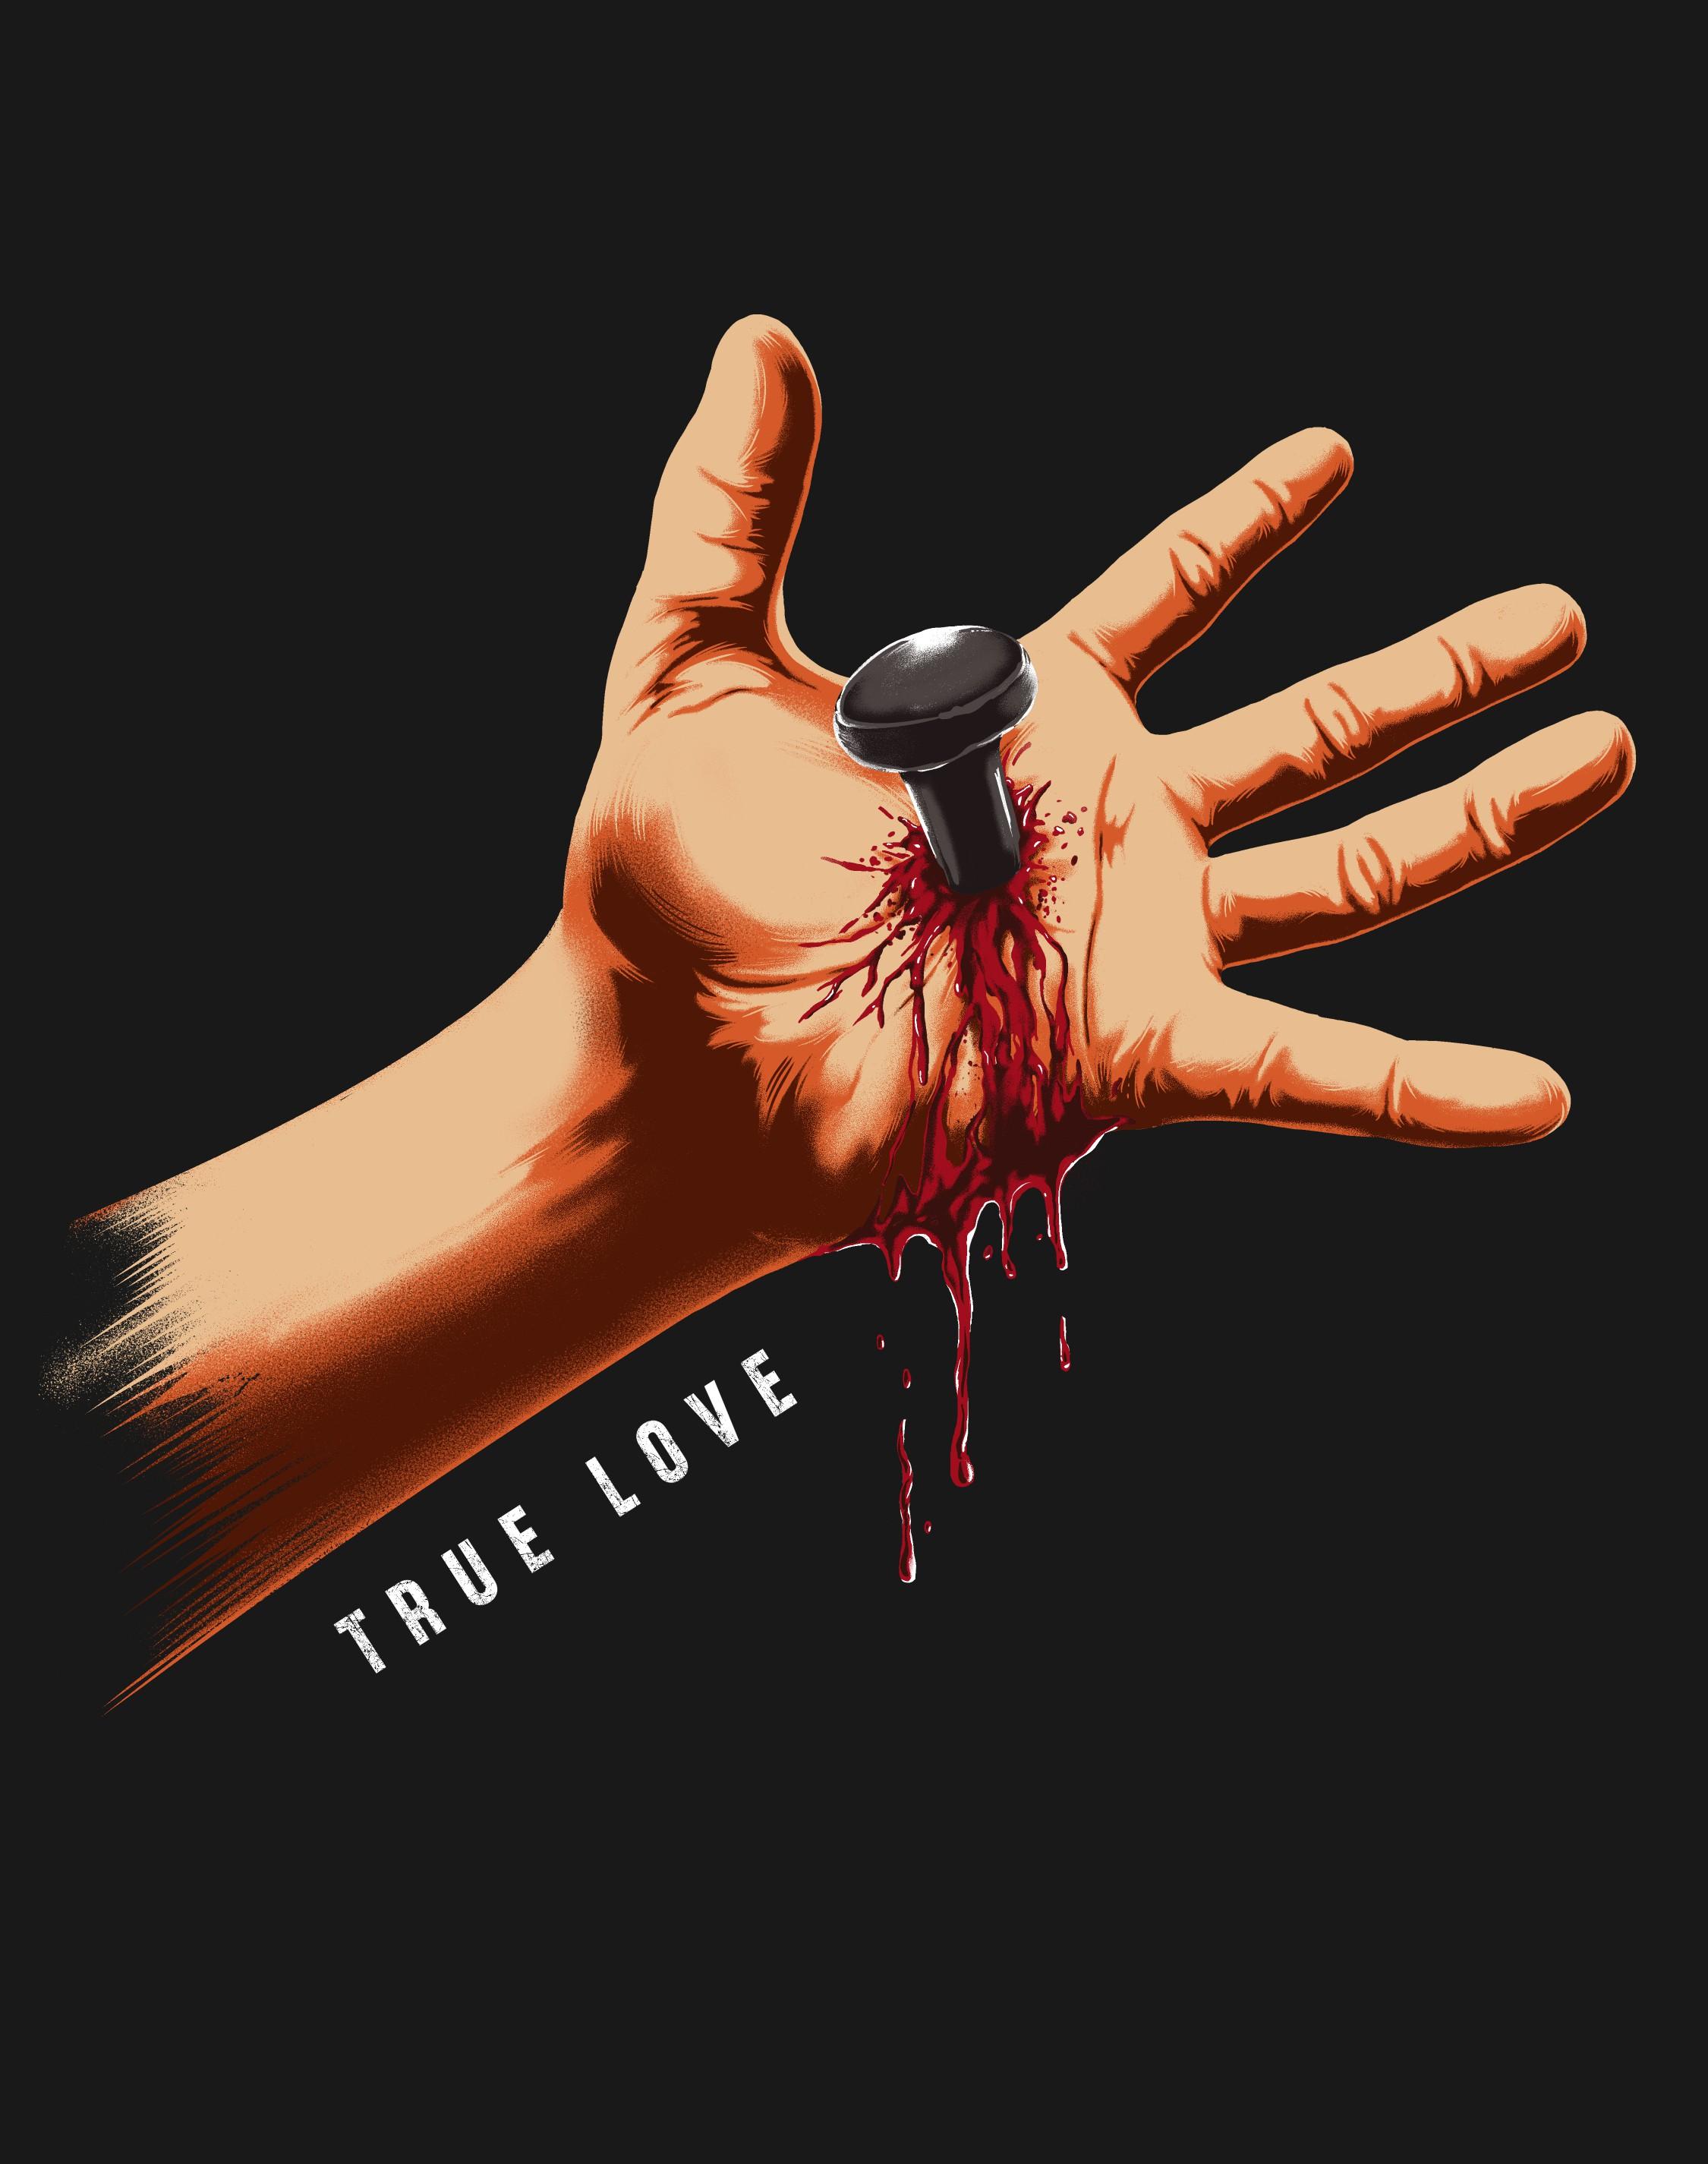 Hand of Christ